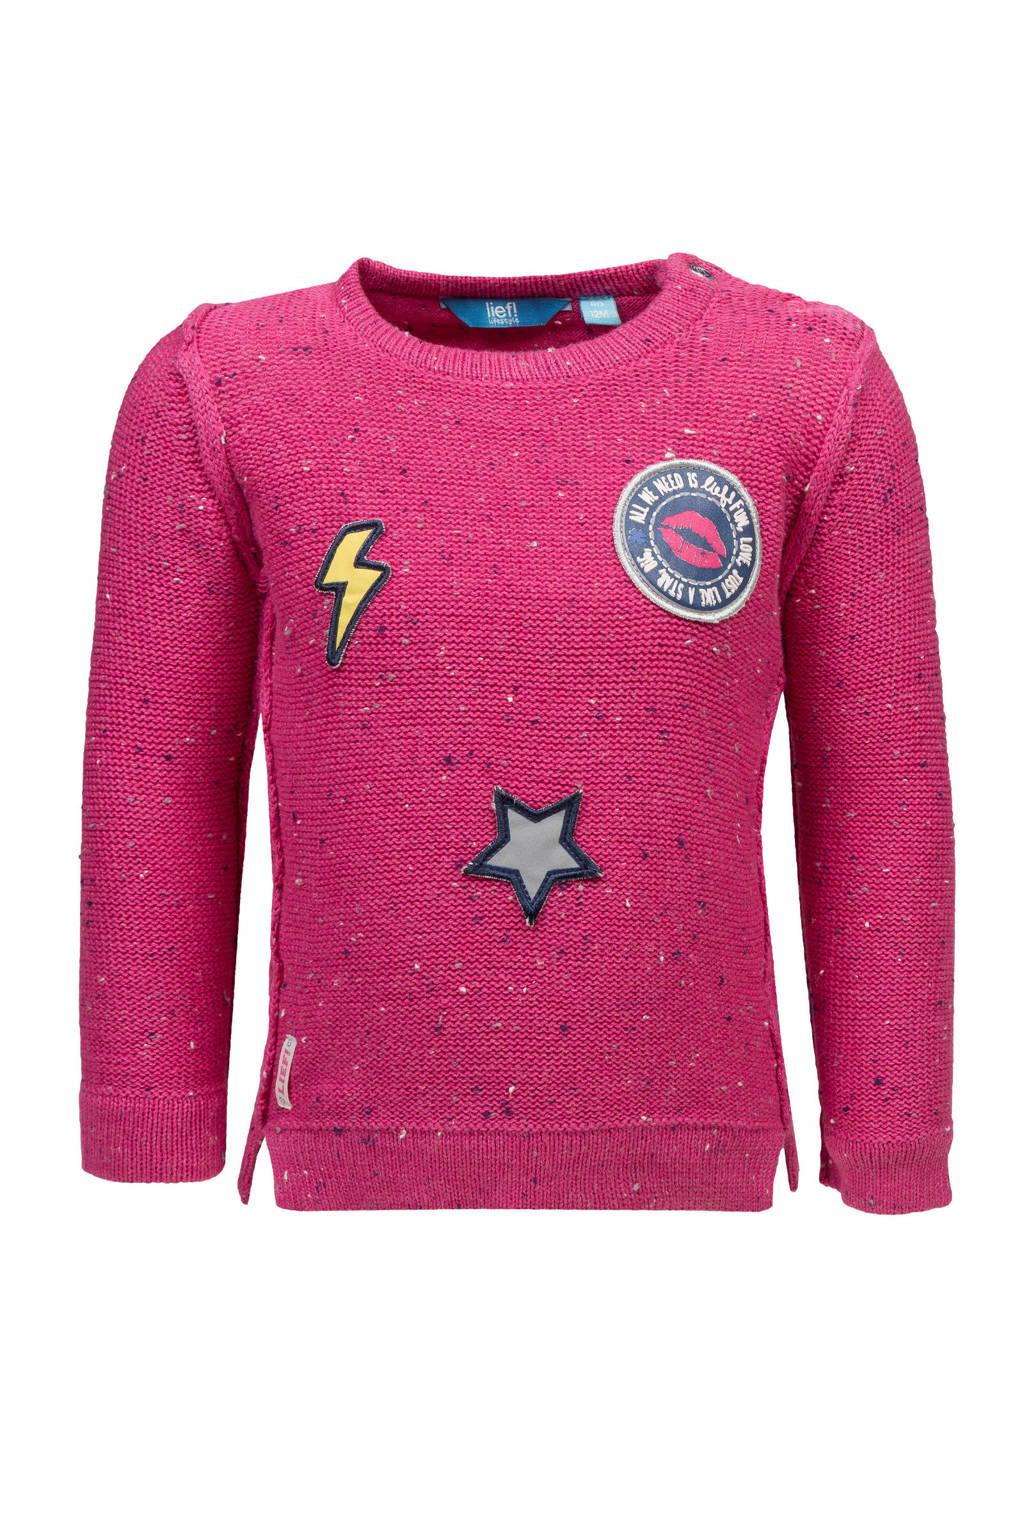 lief! trui met patches roze, Roze